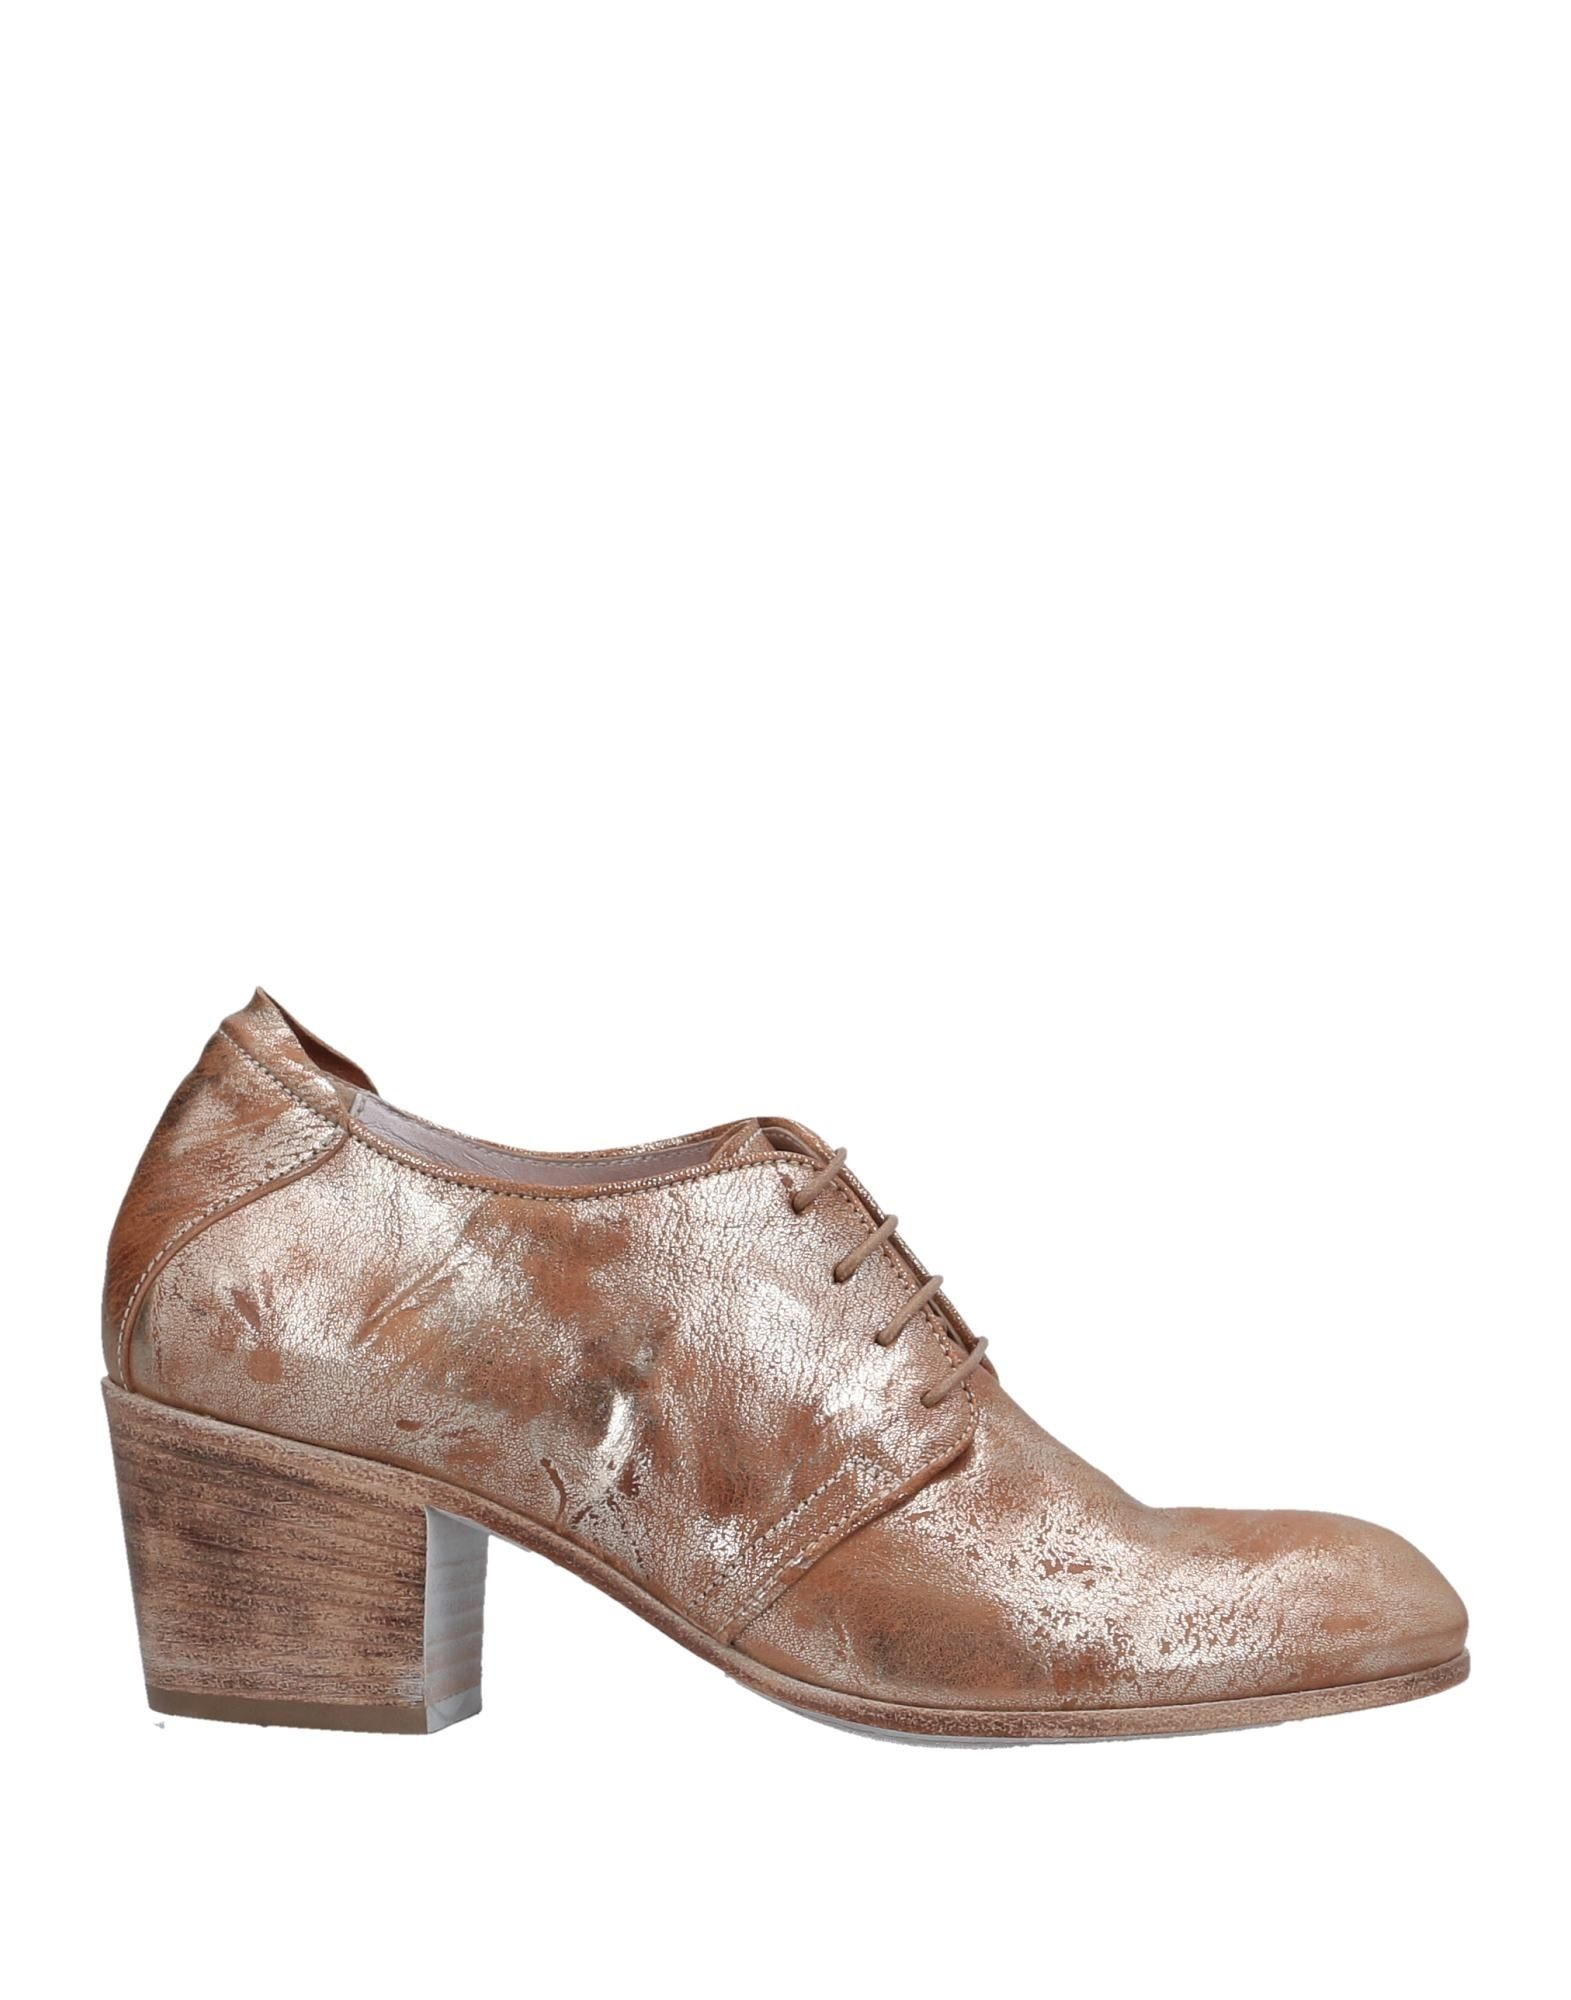 Corvari Schnürschuhe Damen  11509456WD Gute Qualität beliebte Schuhe